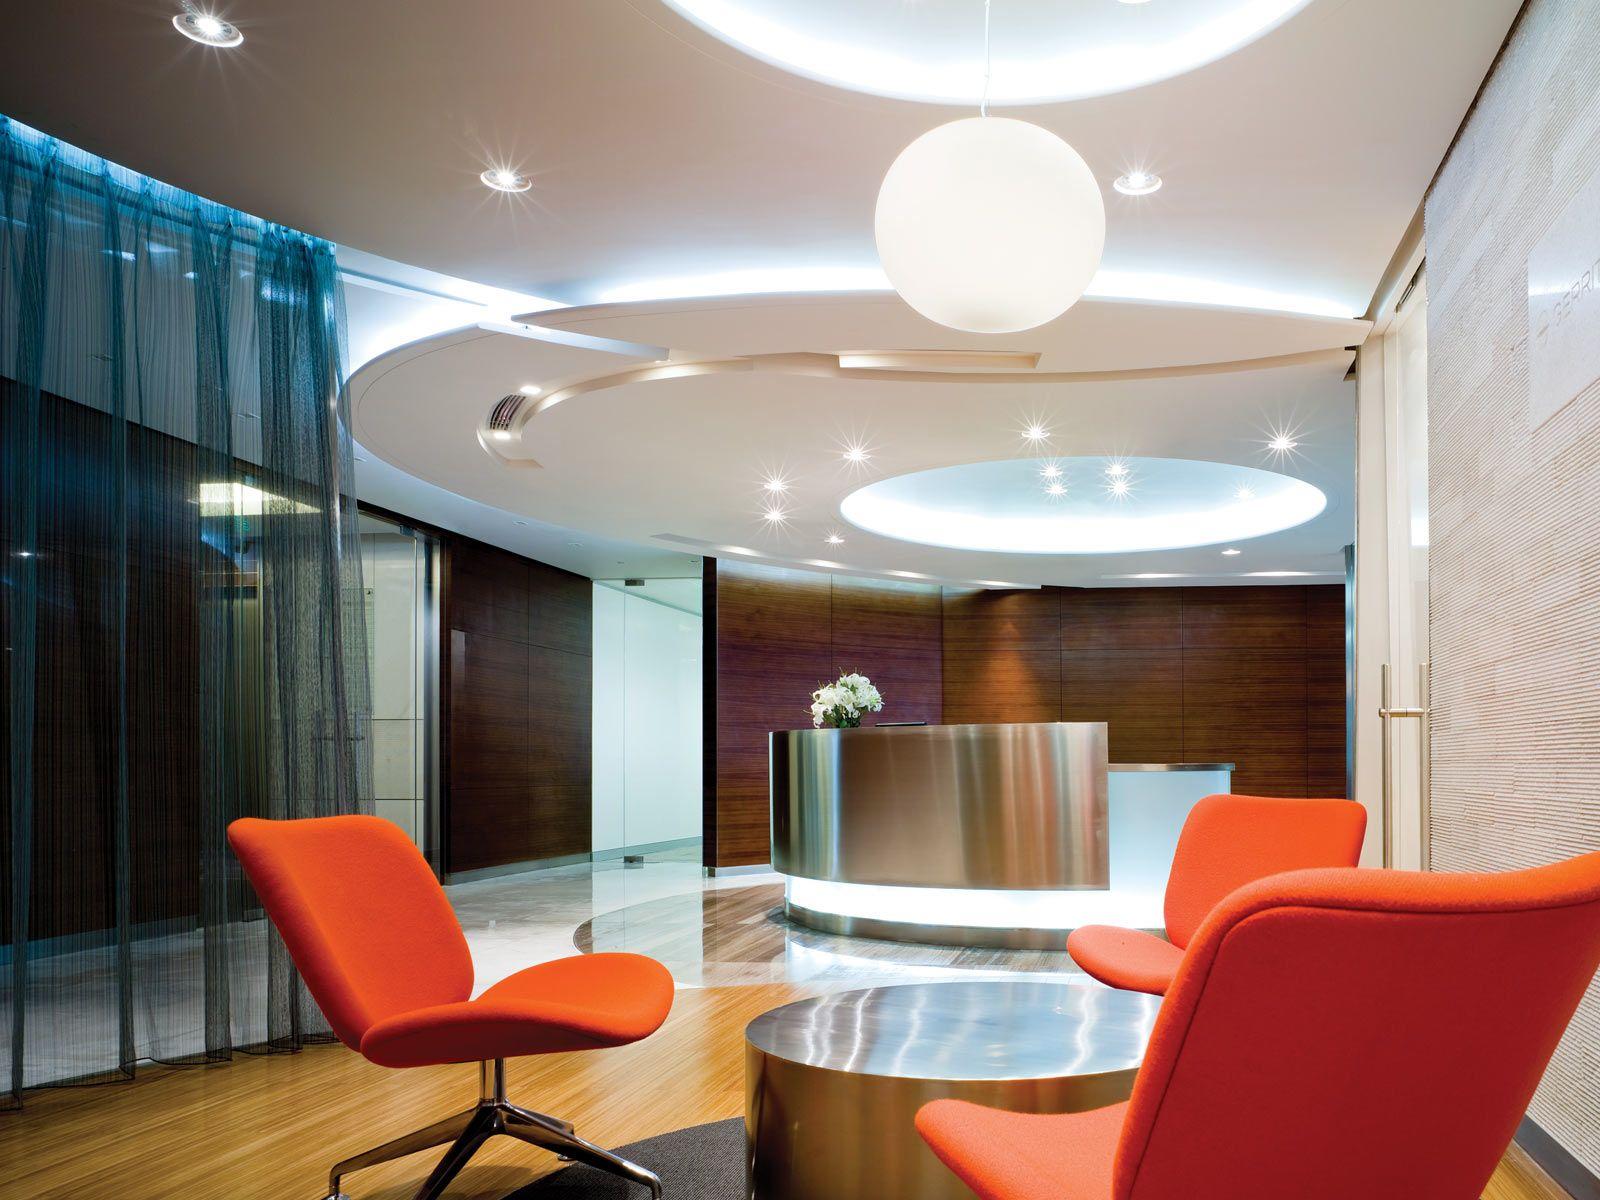 10 Astonishing Lobby Design Ideas That Will Greatly Admire You   Lobby  design  Hotel lobby design and Lobbies. 10 Astonishing Lobby Design Ideas That Will Greatly Admire You